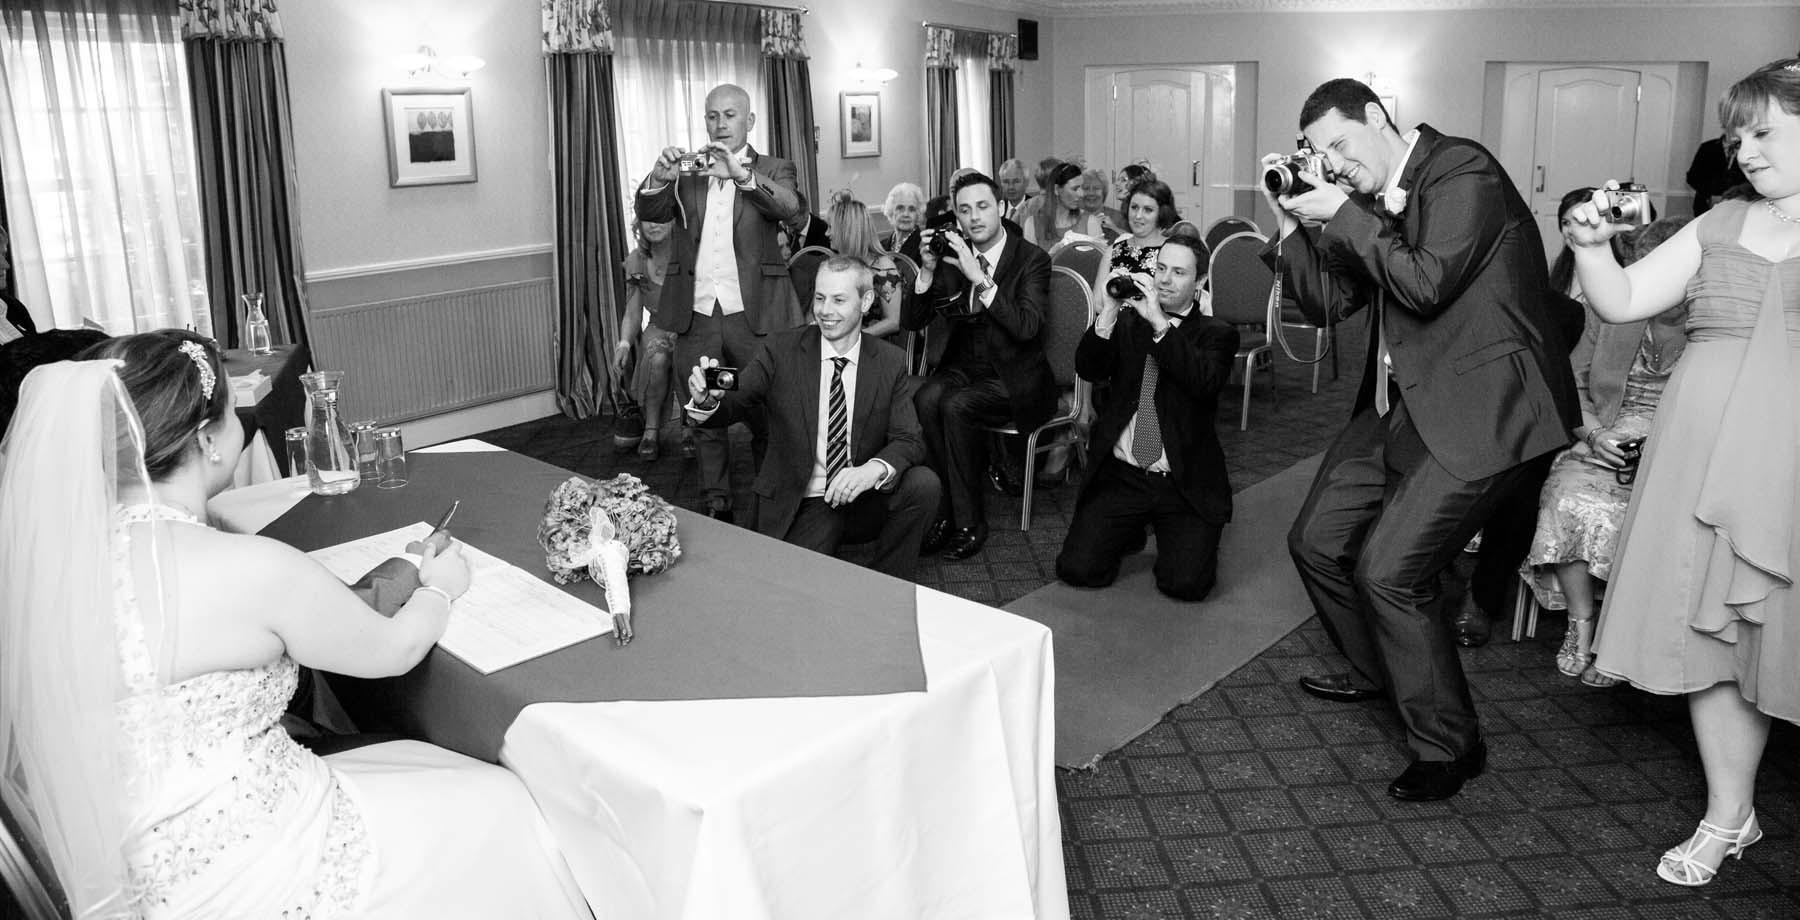 Sussex & Surrey Wedding Photographer - Guests & Groups (20)